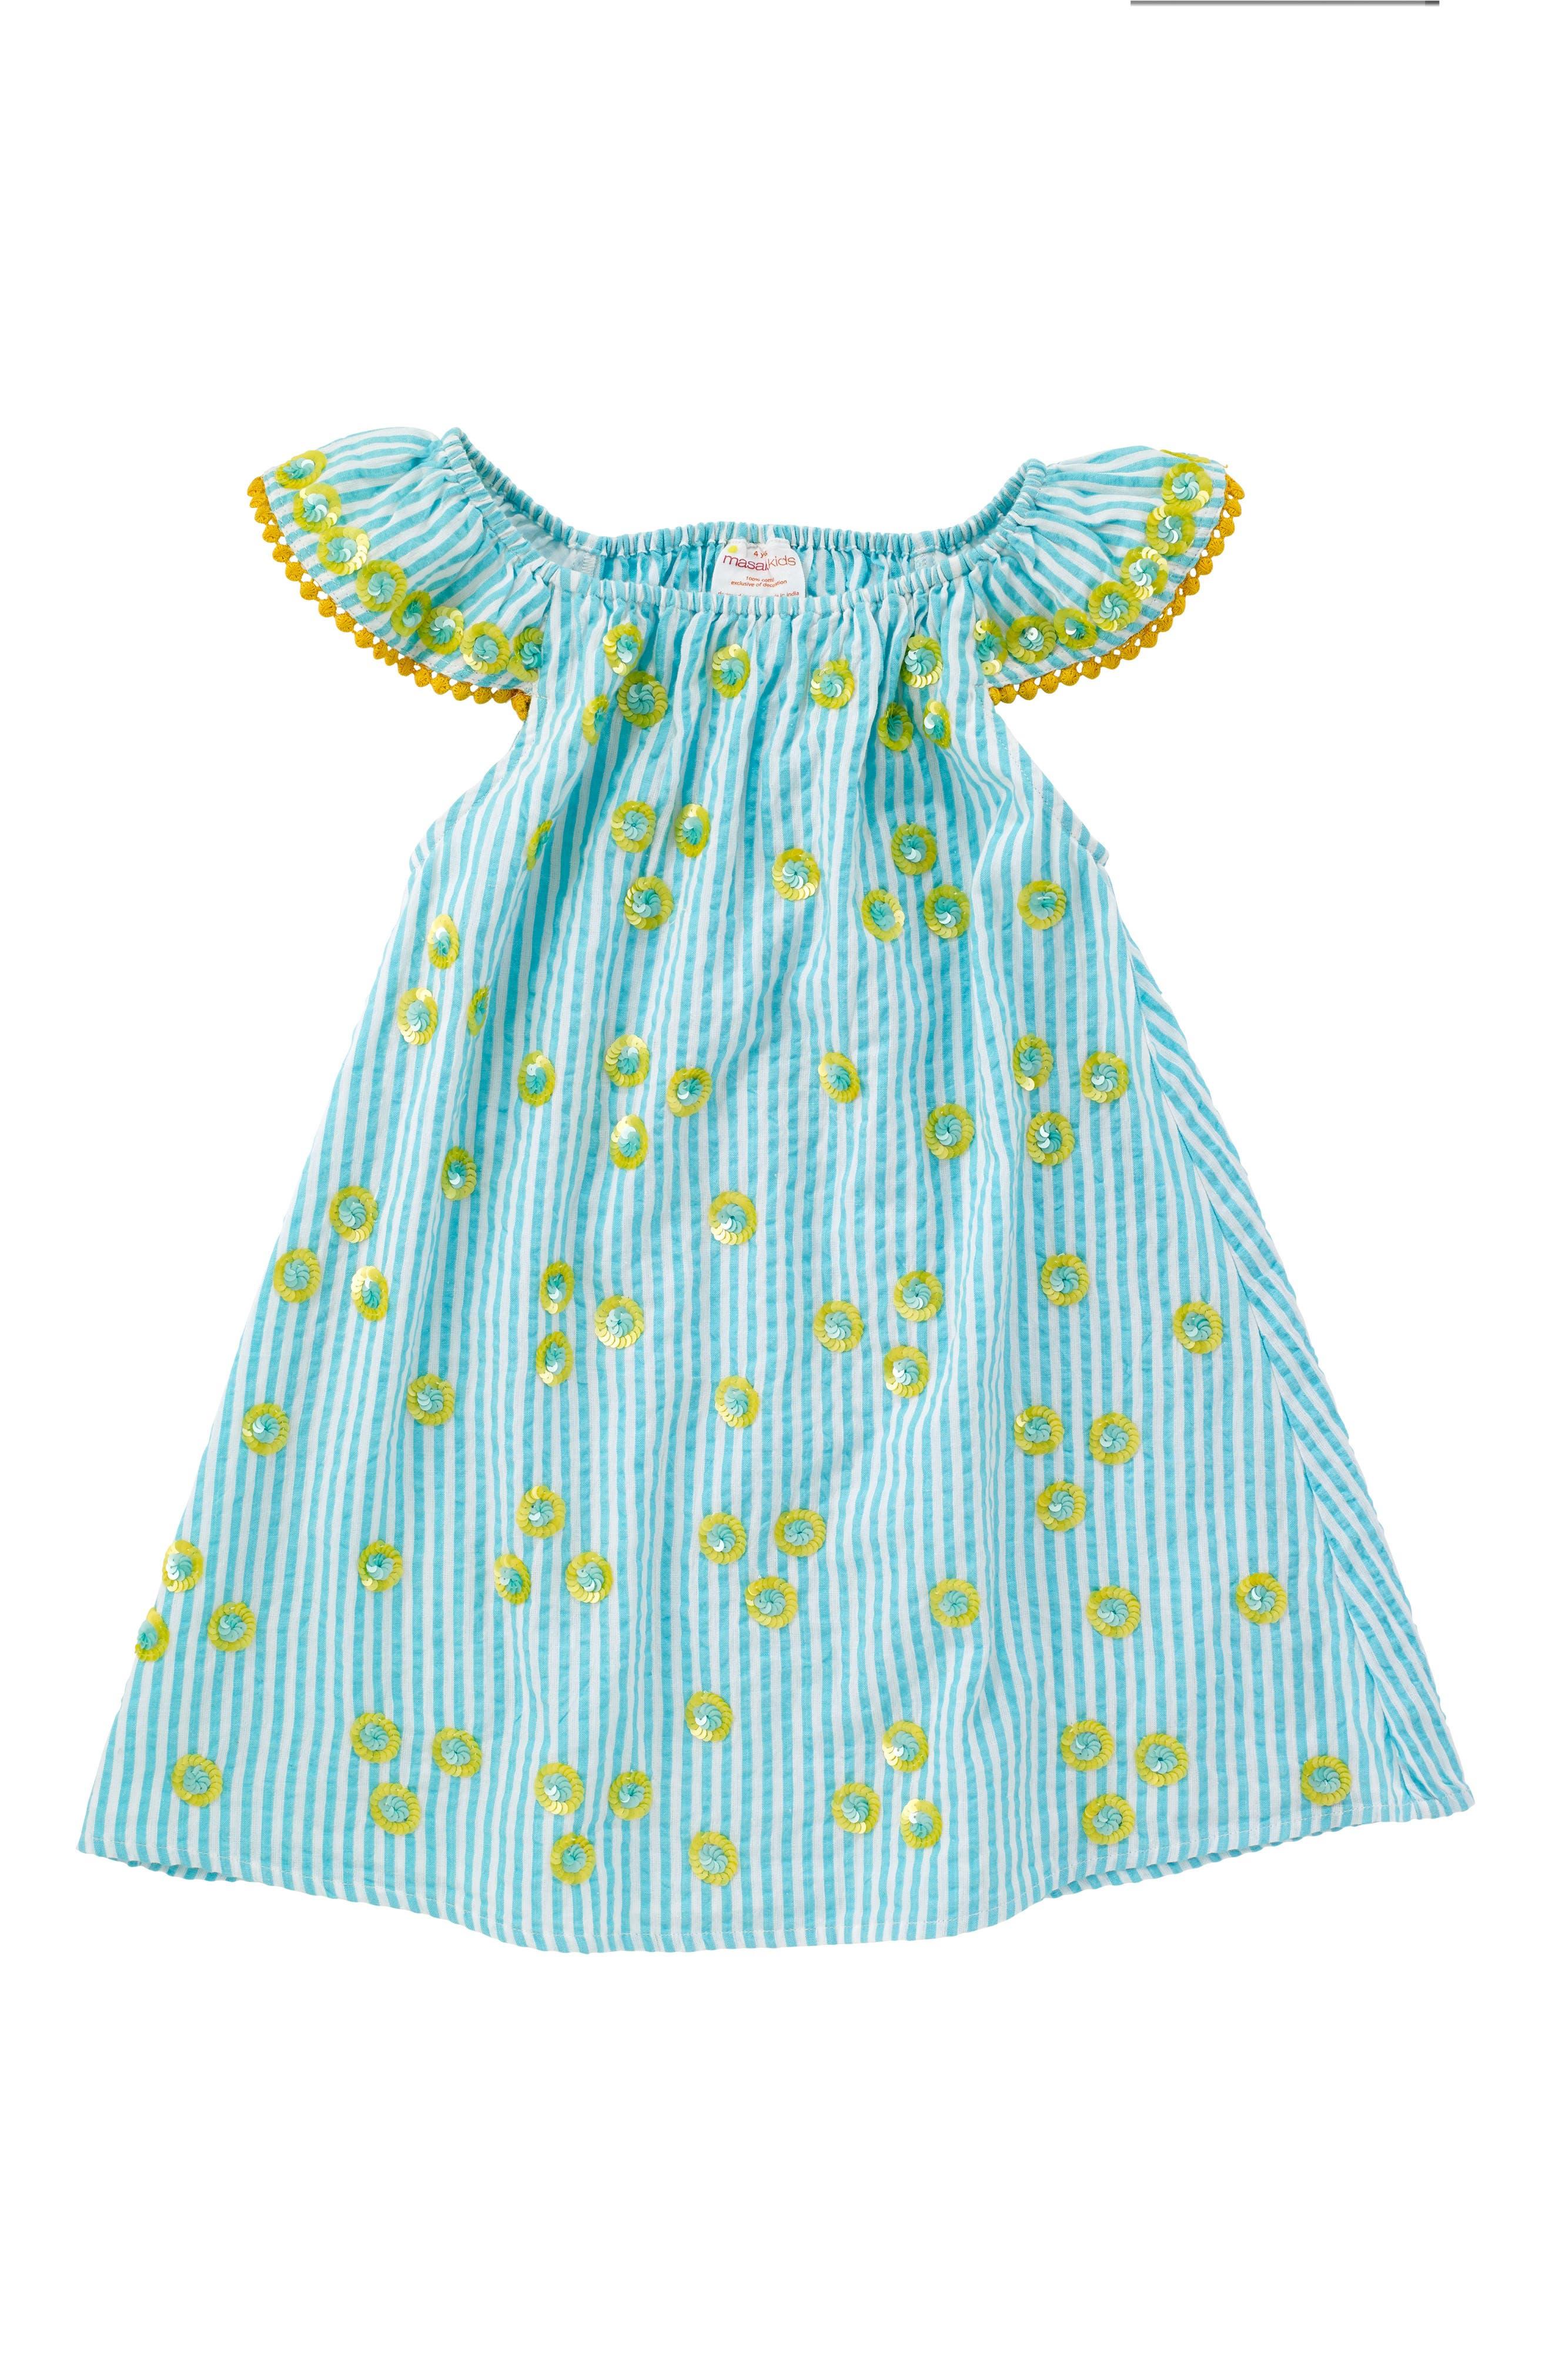 Alternate Image 1 Selected - Masalababy Daisy Flutter Sleeve Dress (Toddler Girls, Little Girls & Big Girls)